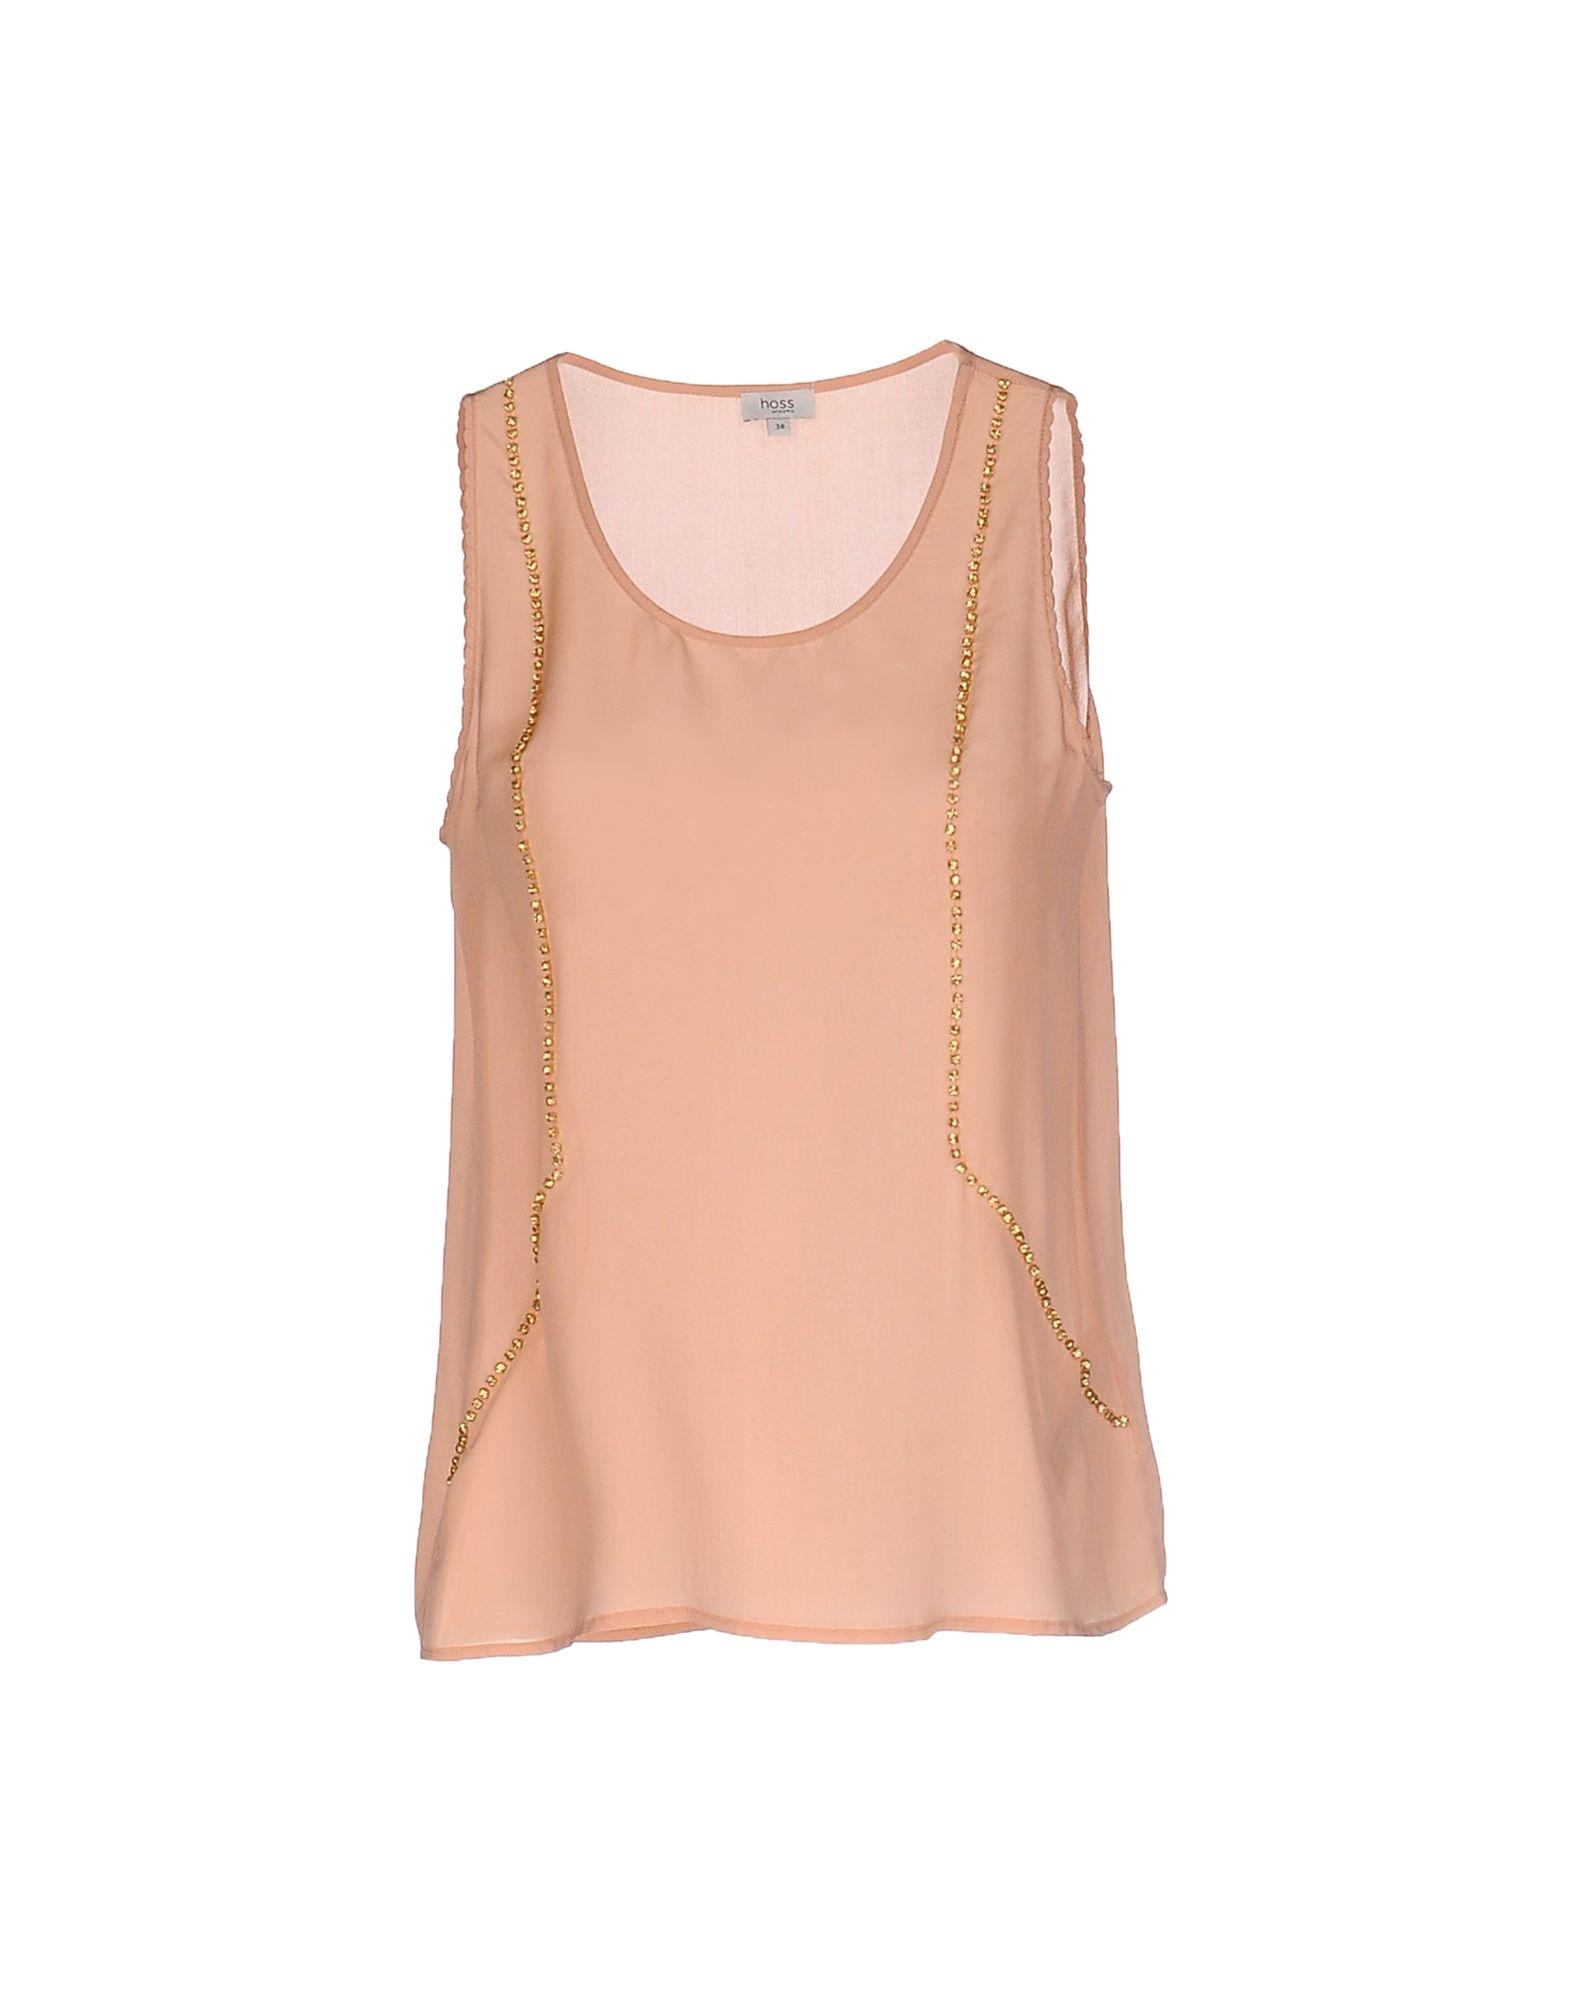 intropia silk top pink women t shirts and topshoss intropia dressworld